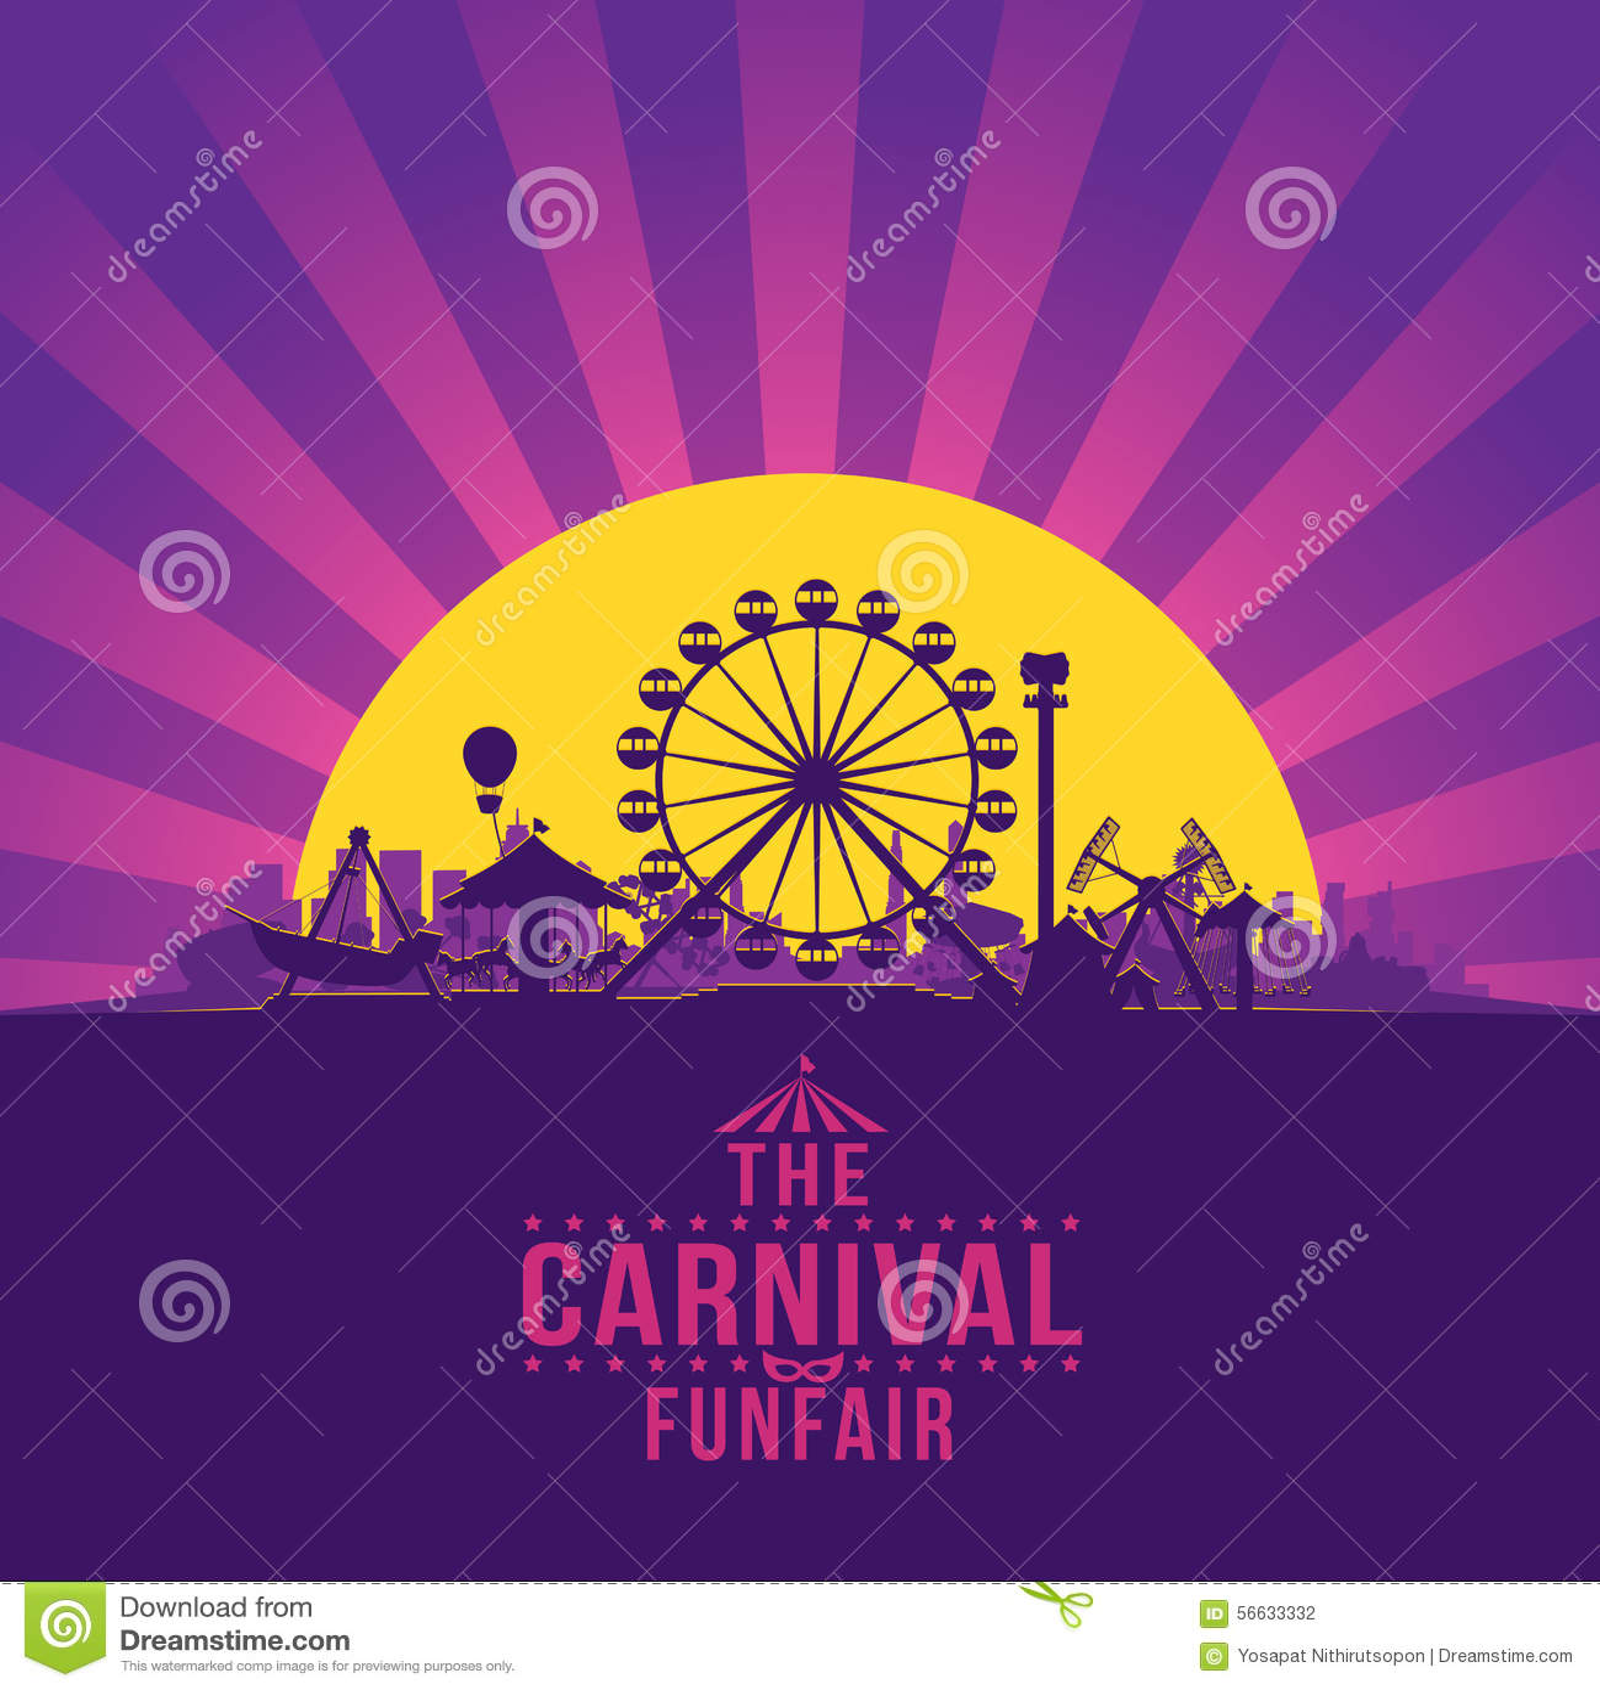 Carnaval funfair